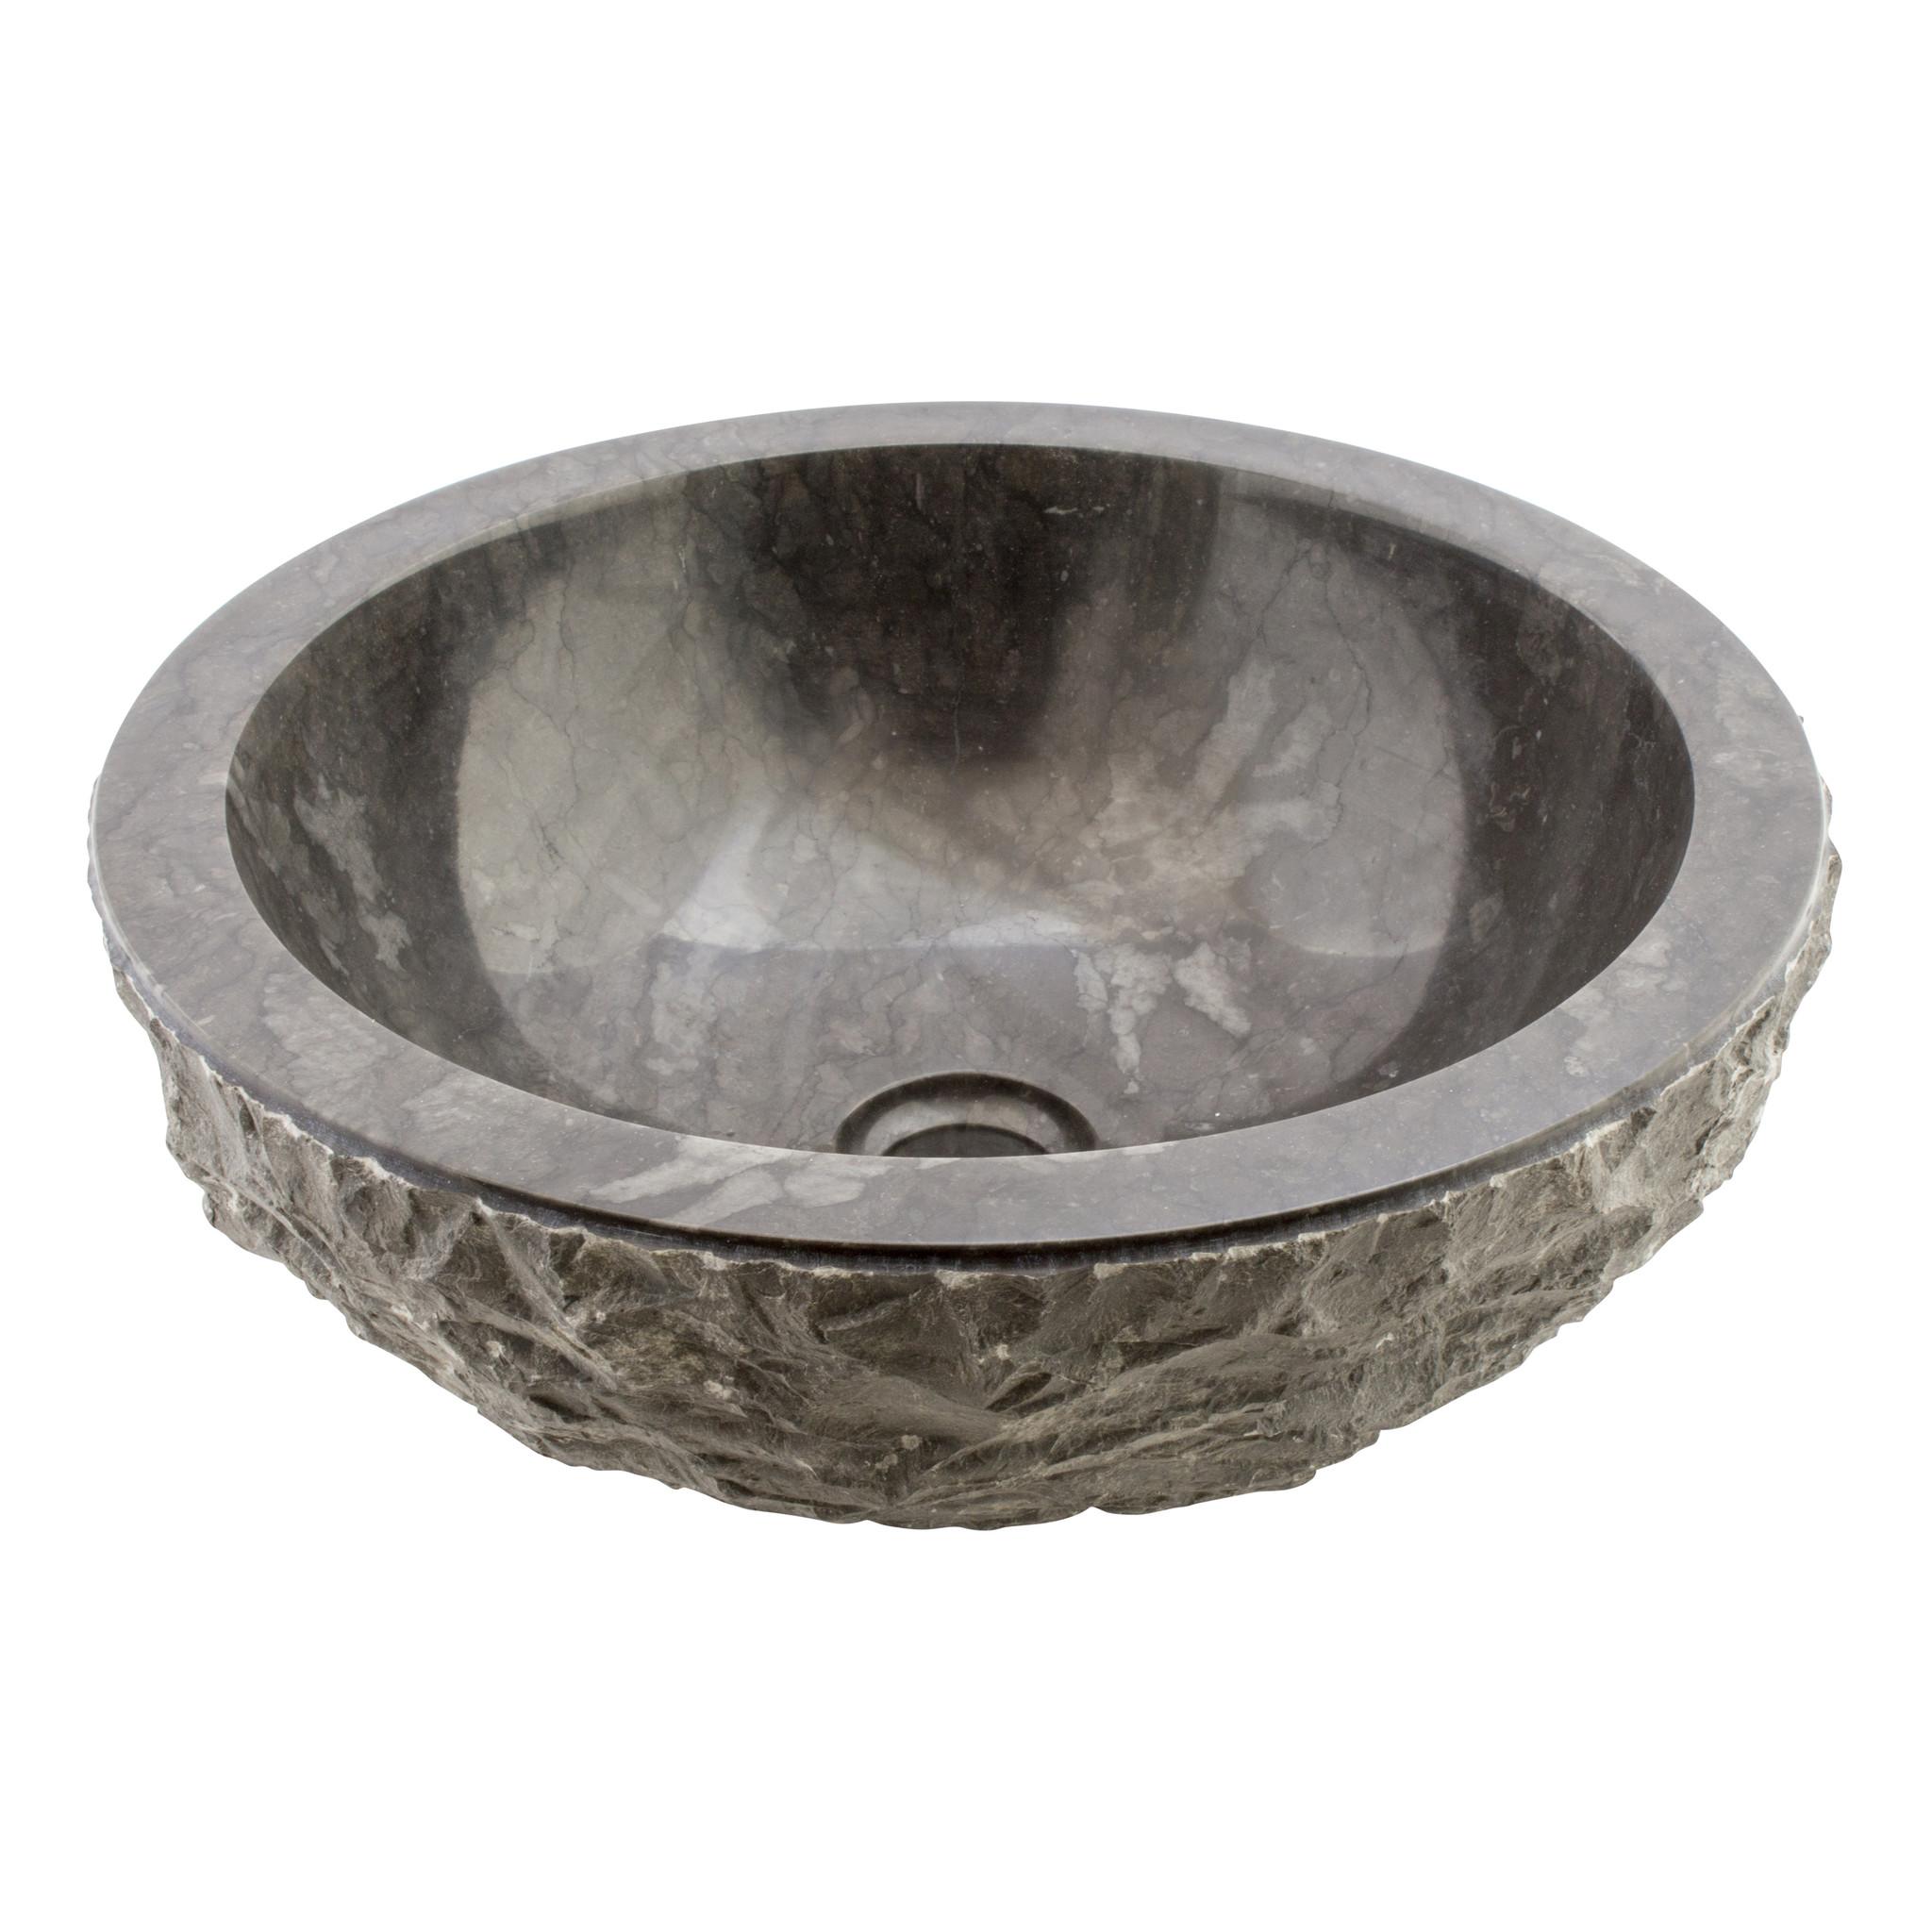 Indomarmer Waskom Full-Marmo Zwart Marmer Ø 40 x H 15 cm